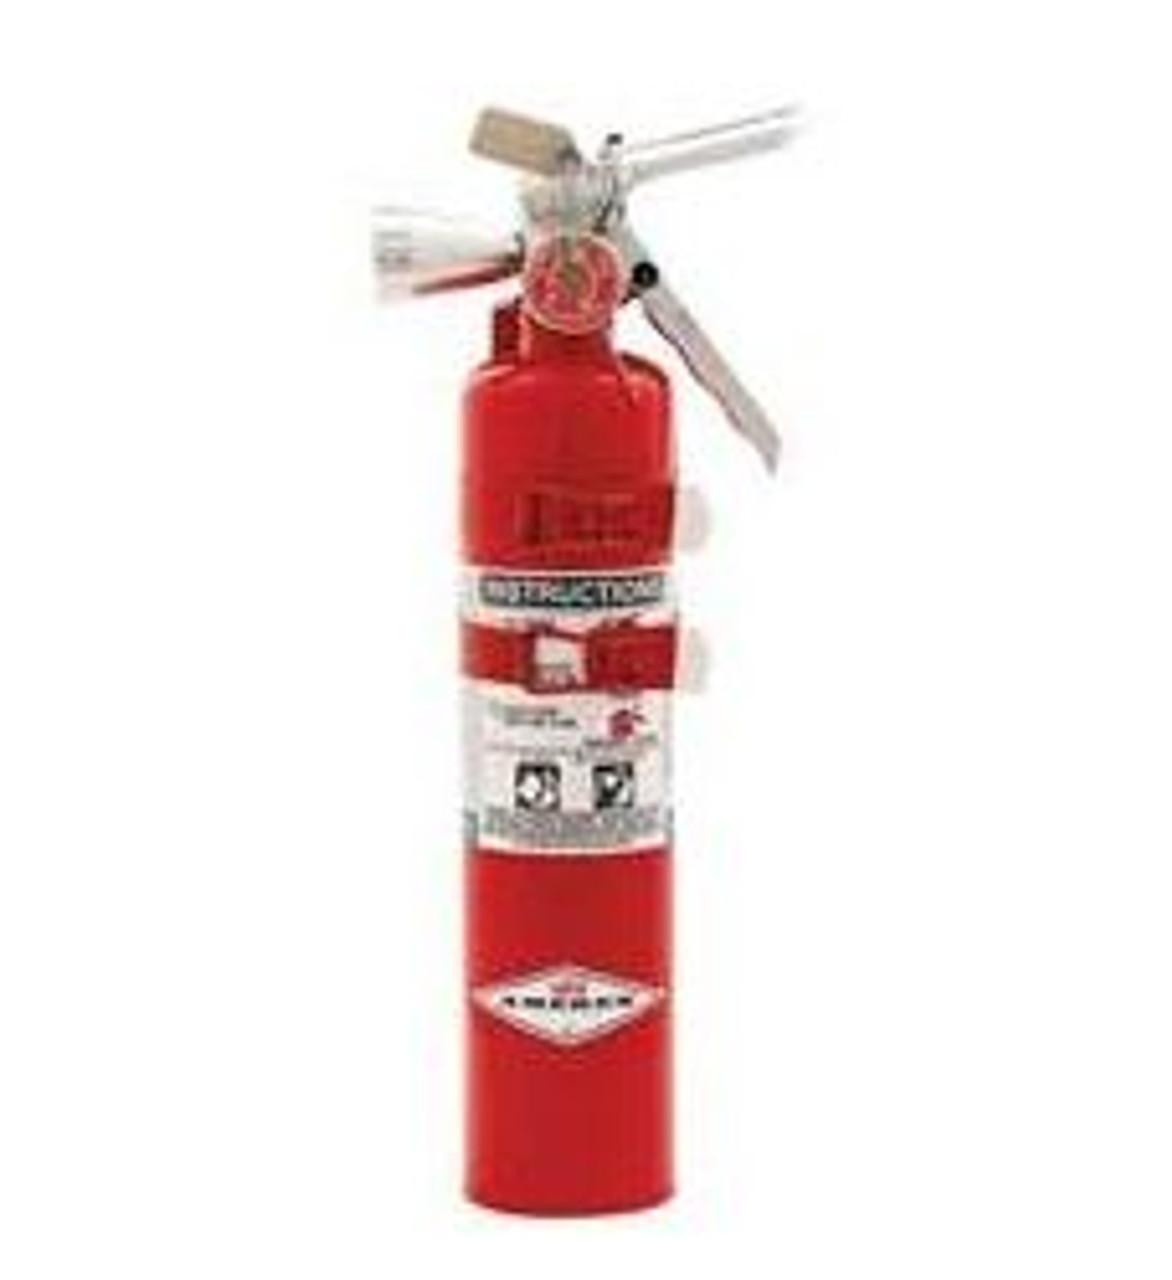 Amerex B385TS - 2.5 lb Halotron Fire Extinguisher